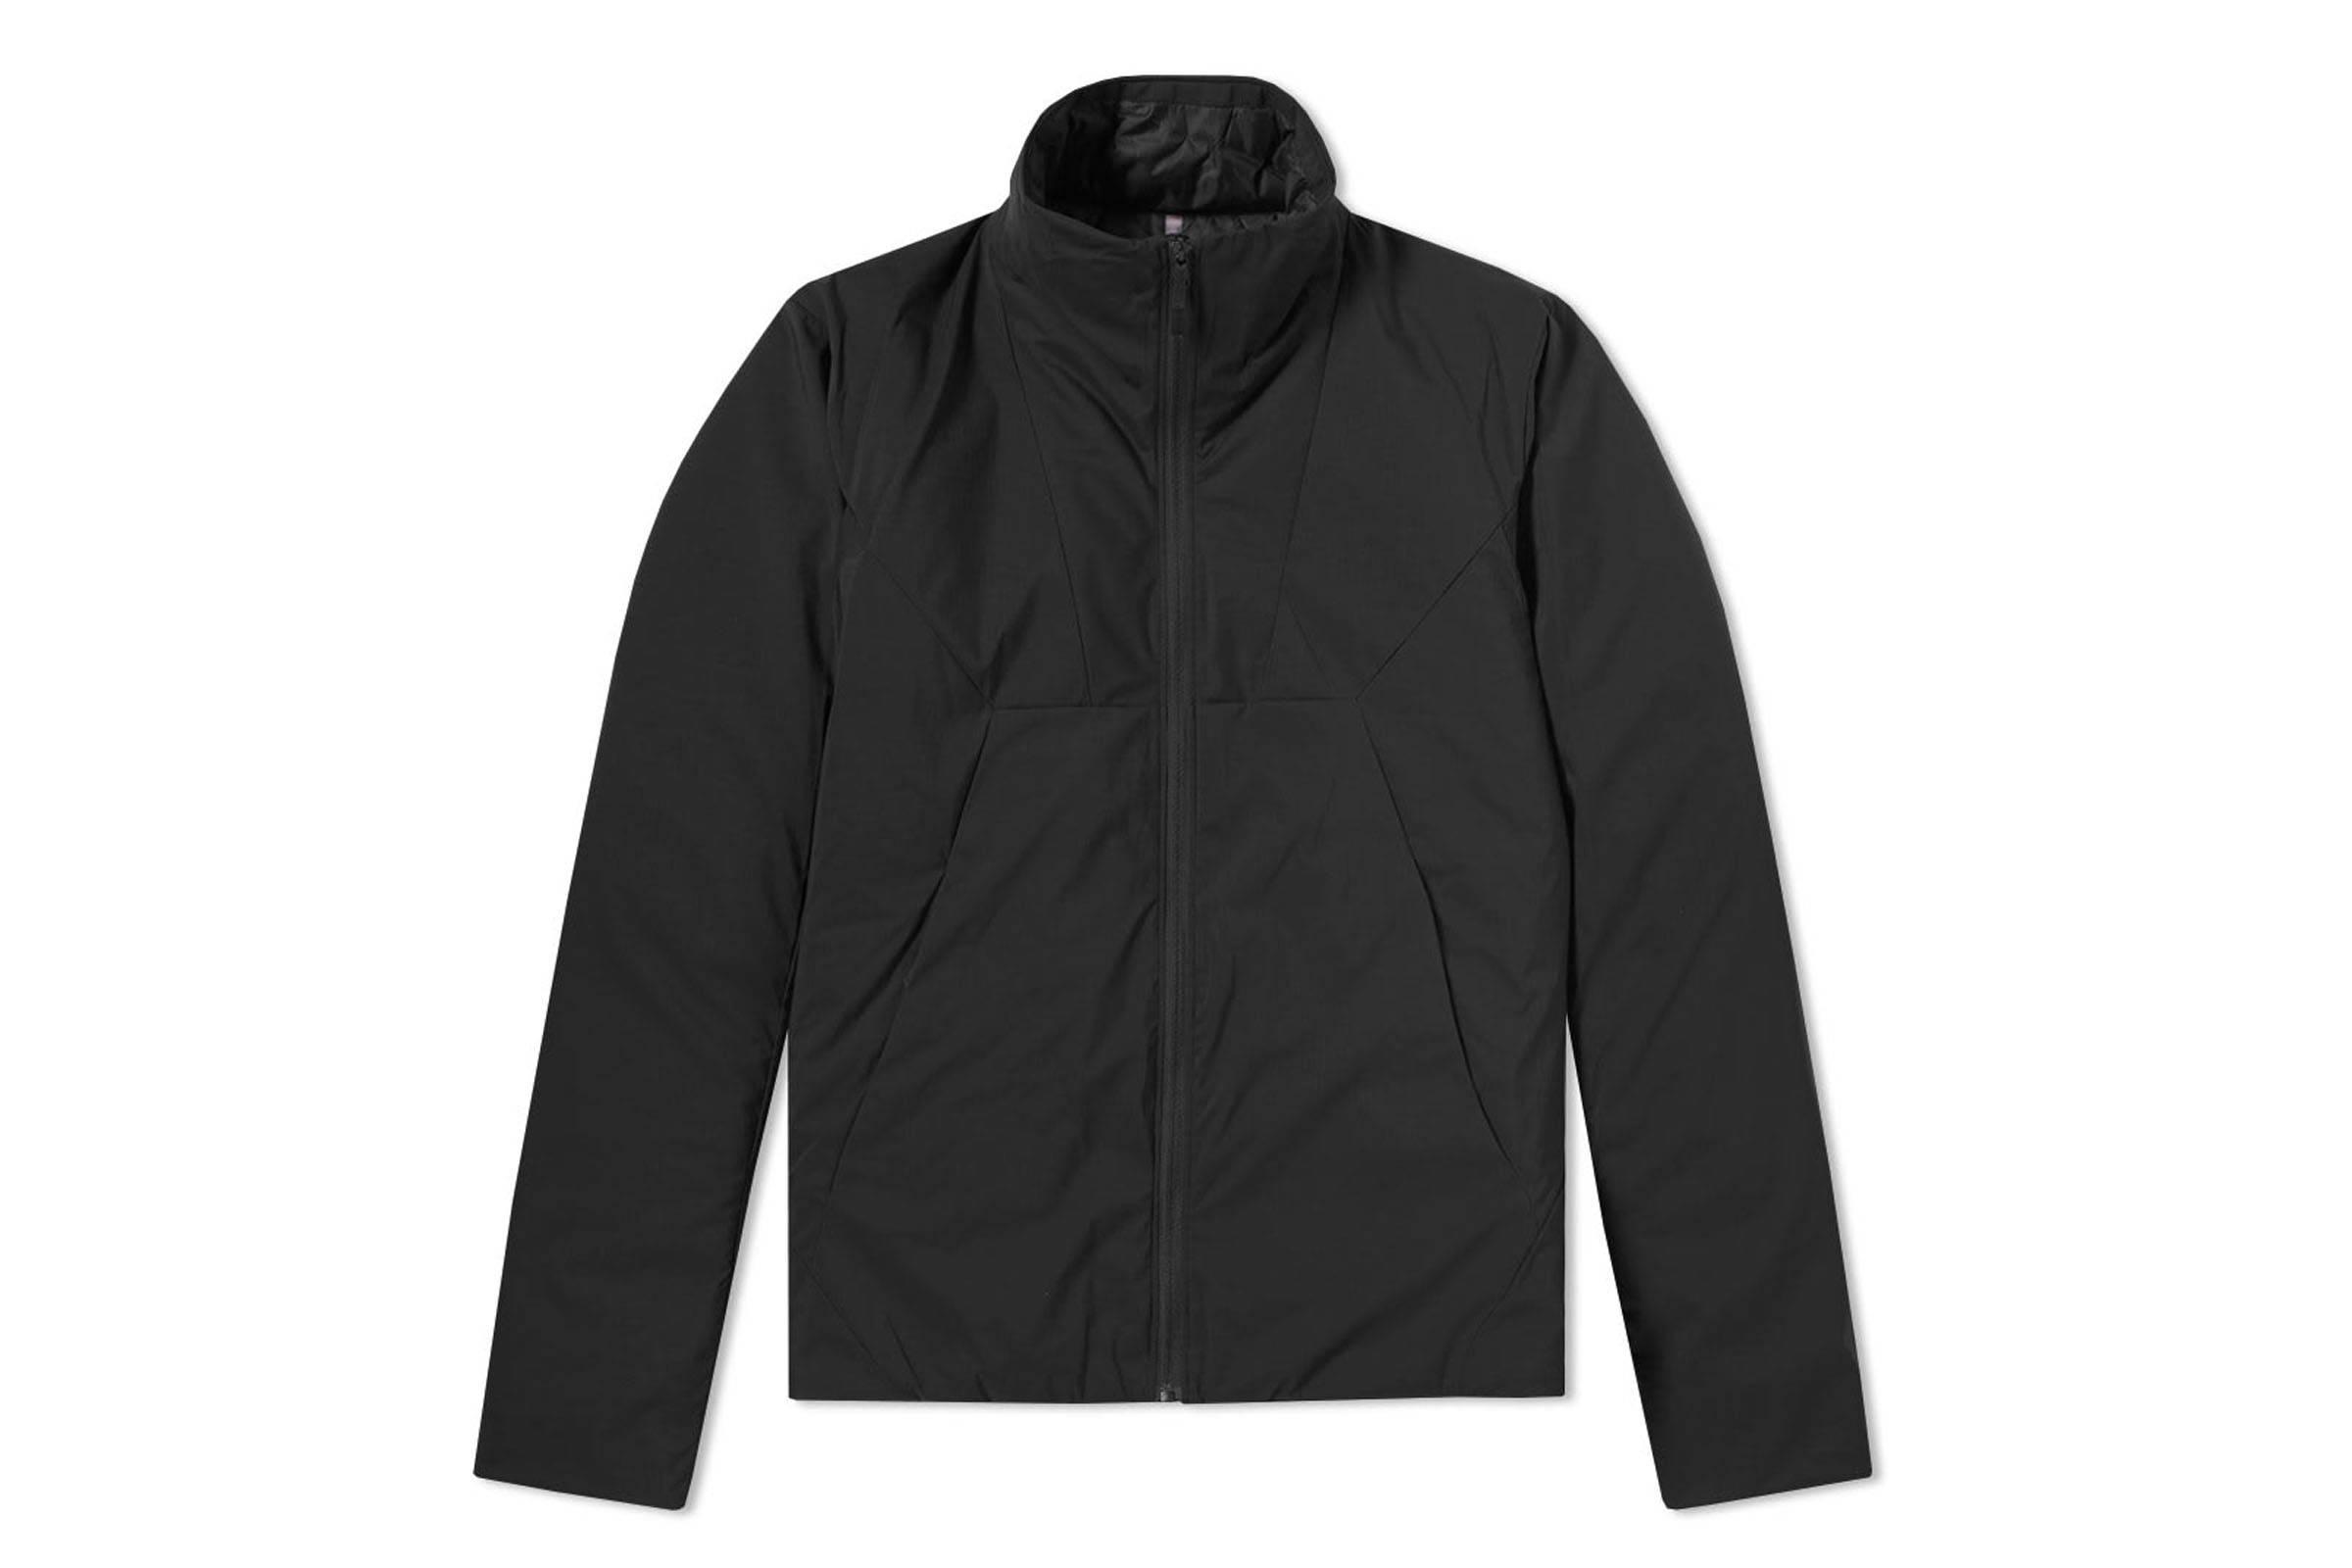 Veilance Mionn IS Jacket